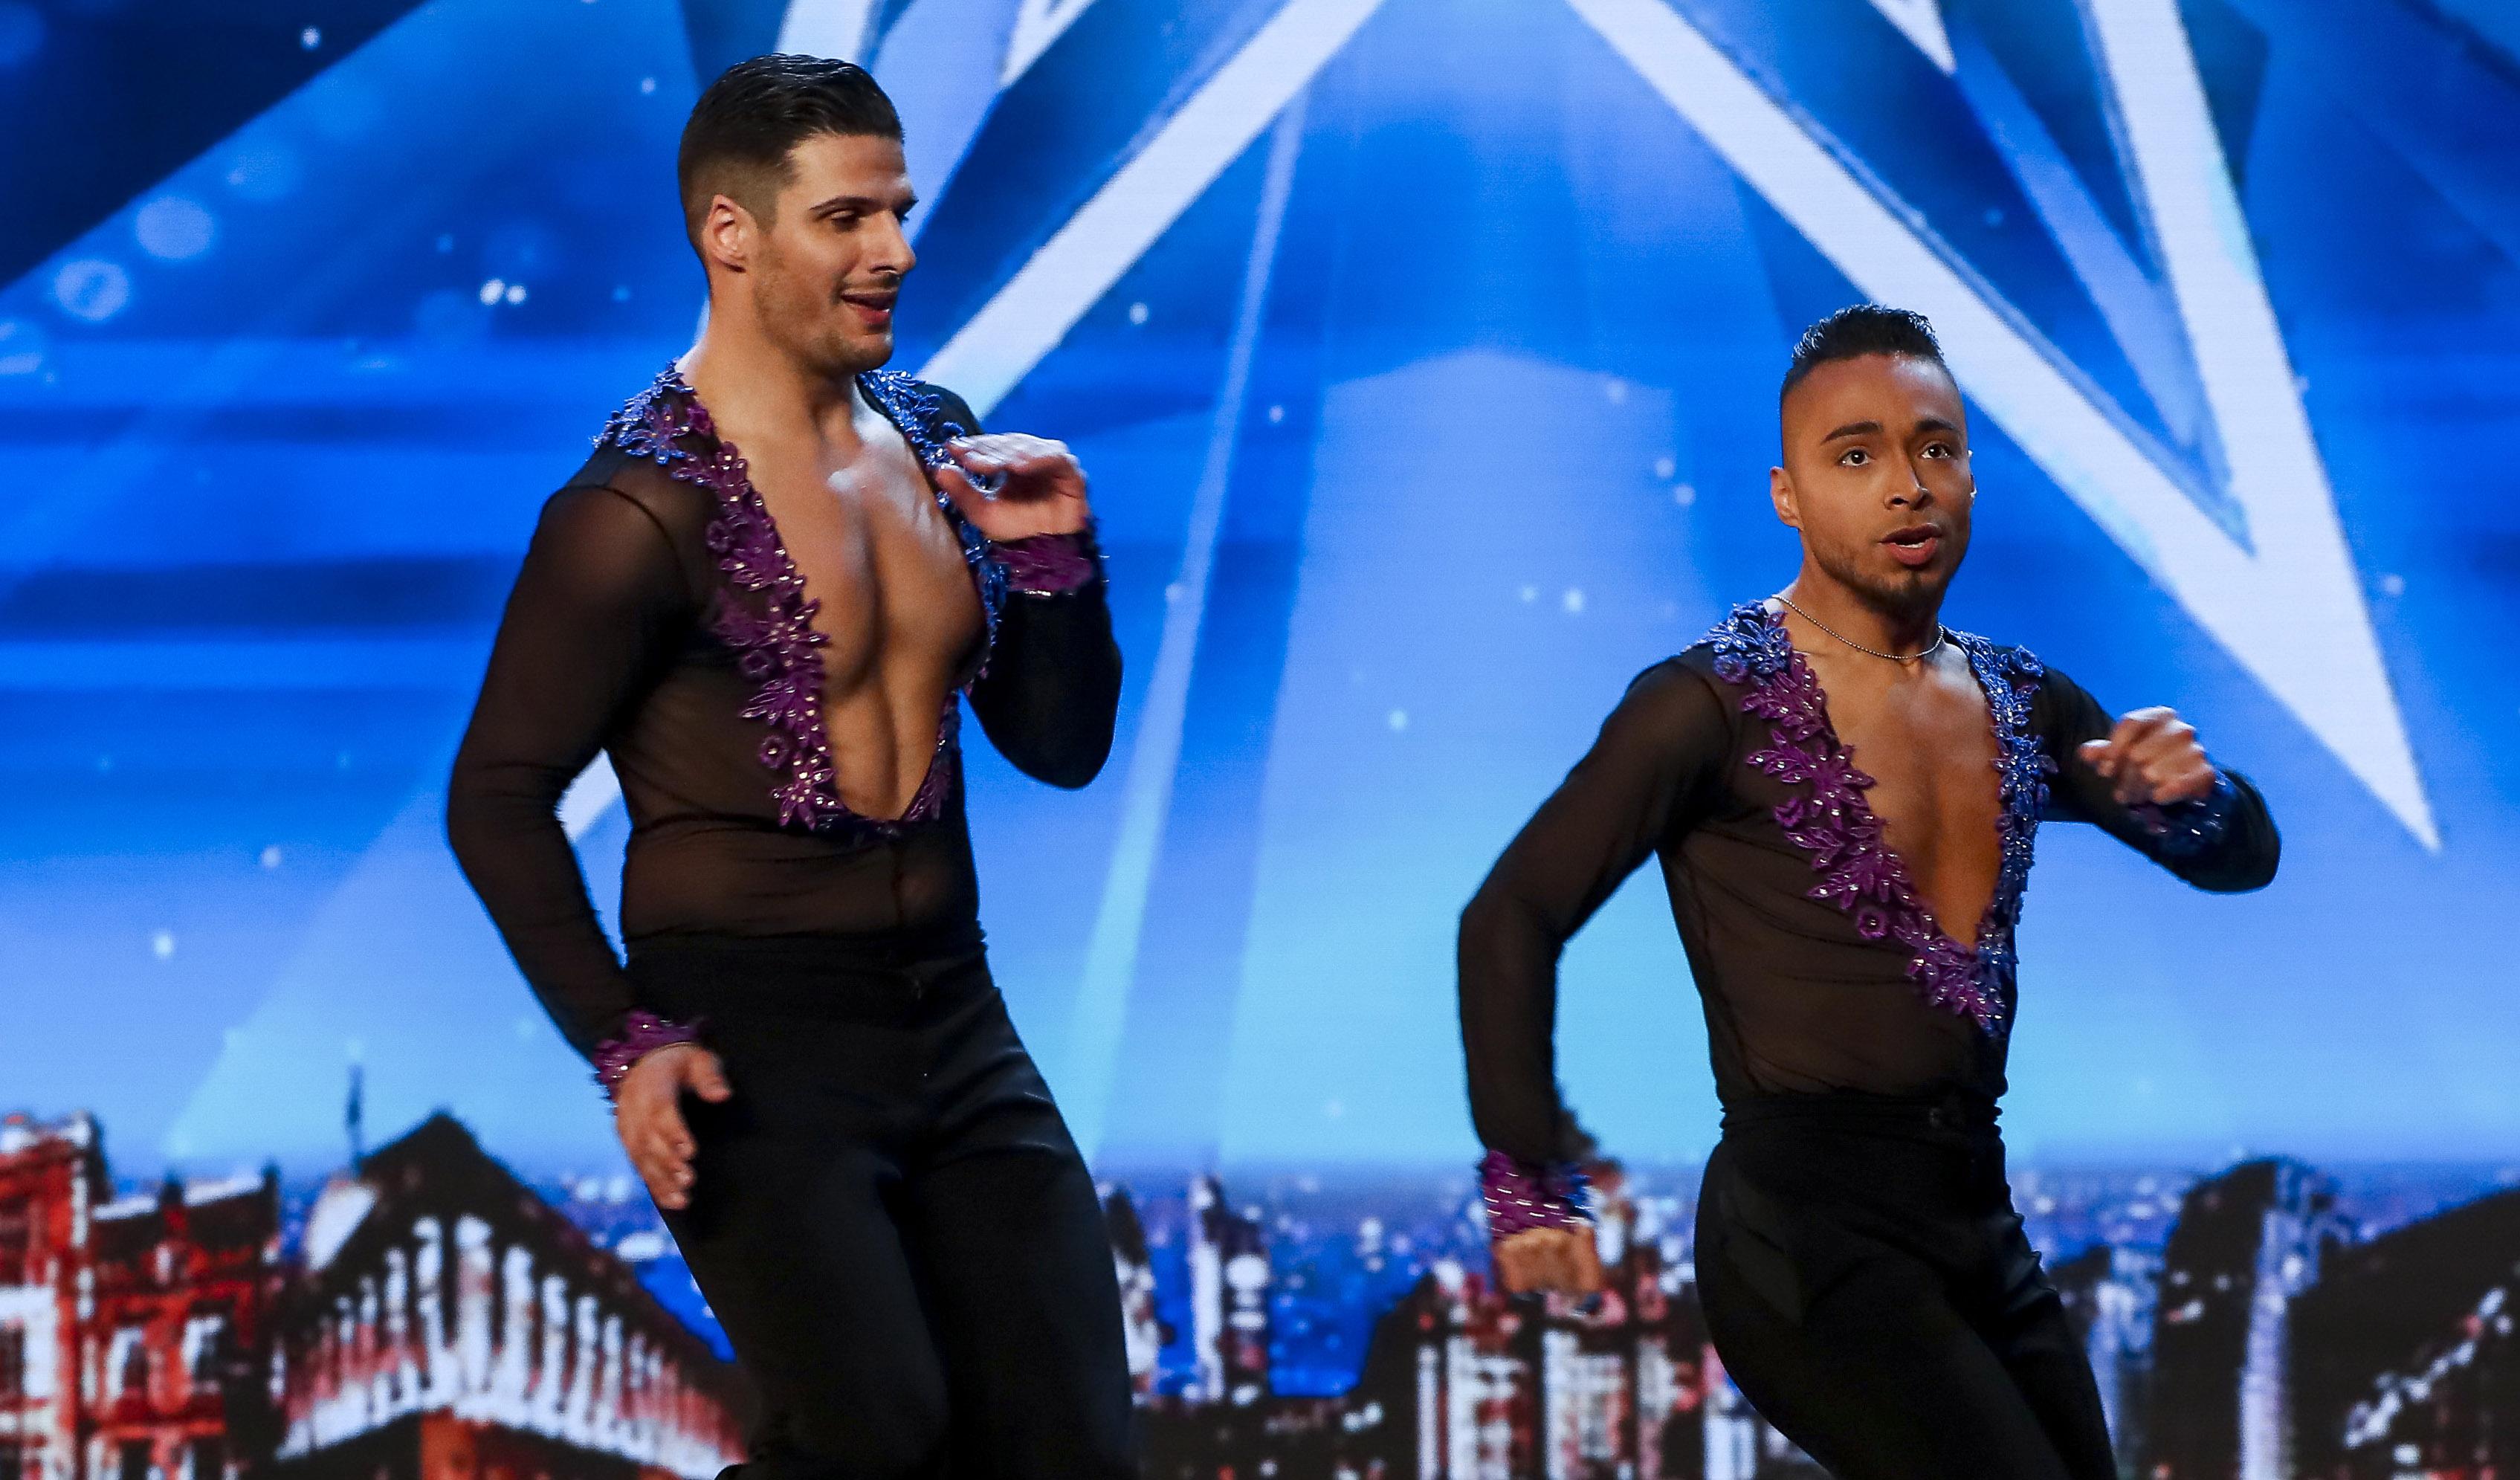 Britain's Got Talent David and Javier